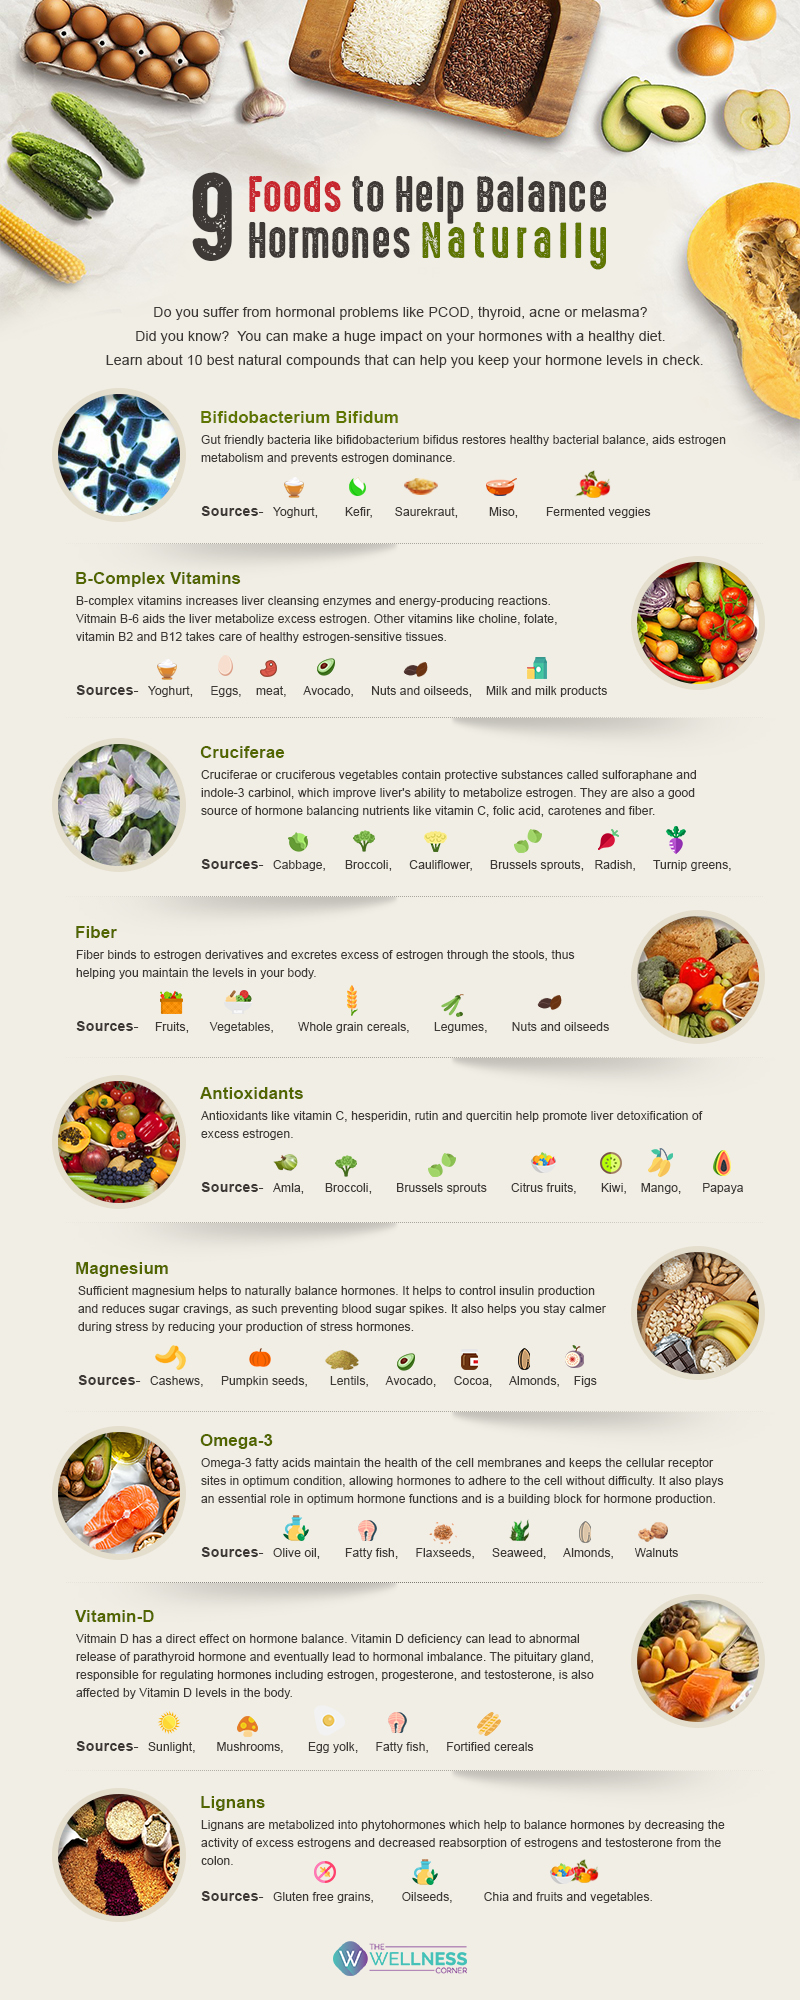 Foods to help balance hormones naturally